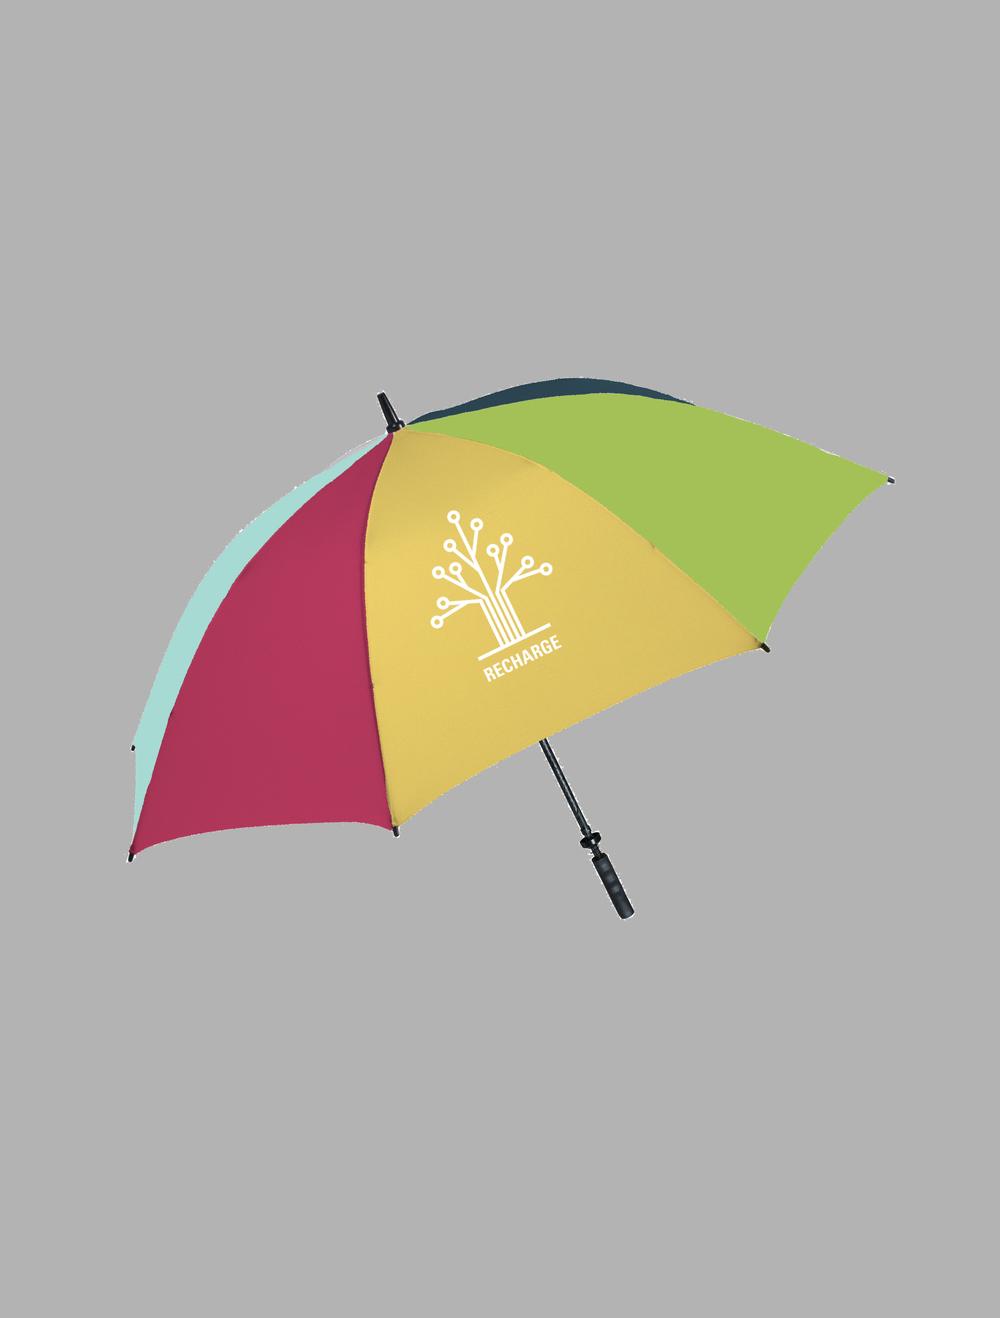 umbrellamockup.jpg